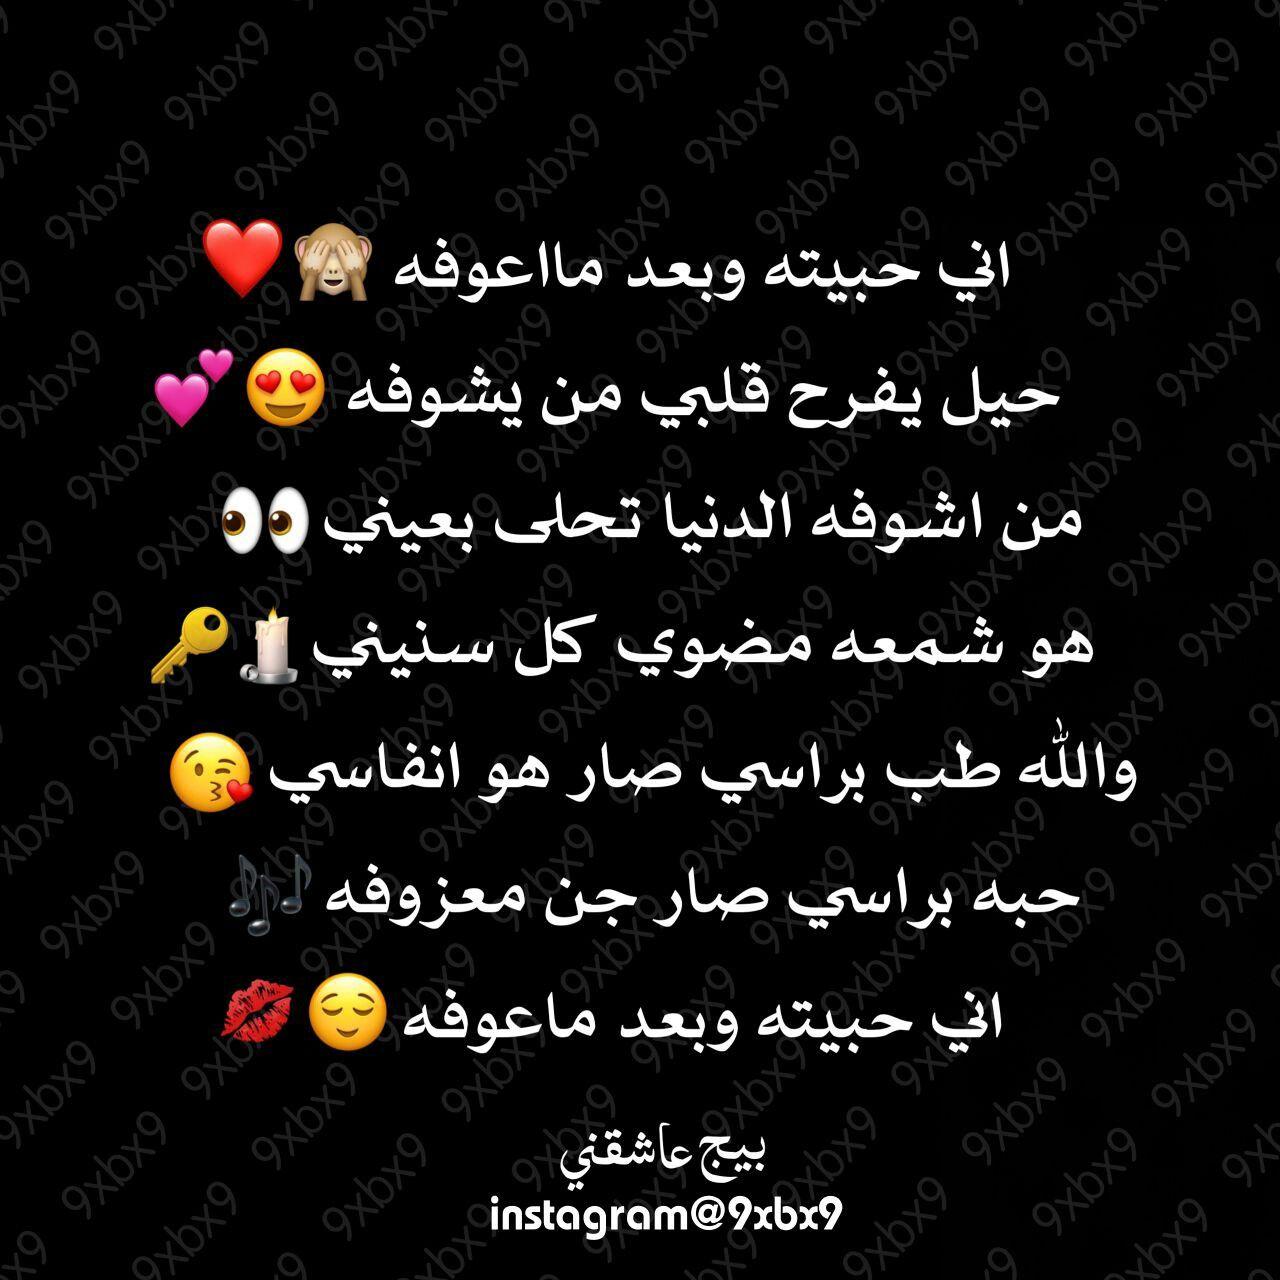 غزل عراقي حب شعر Love Husband Quotes Cool Words Arabic Love Quotes